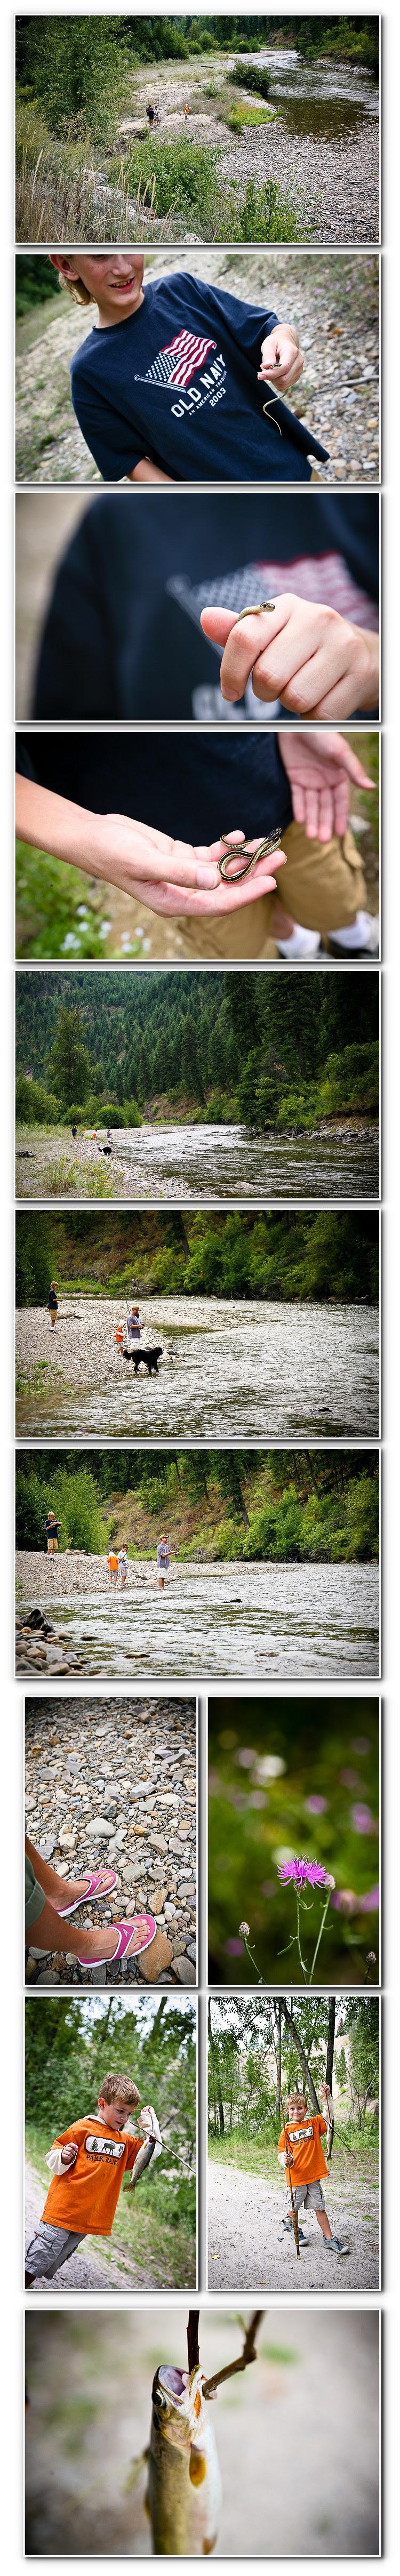 fishing destination 1